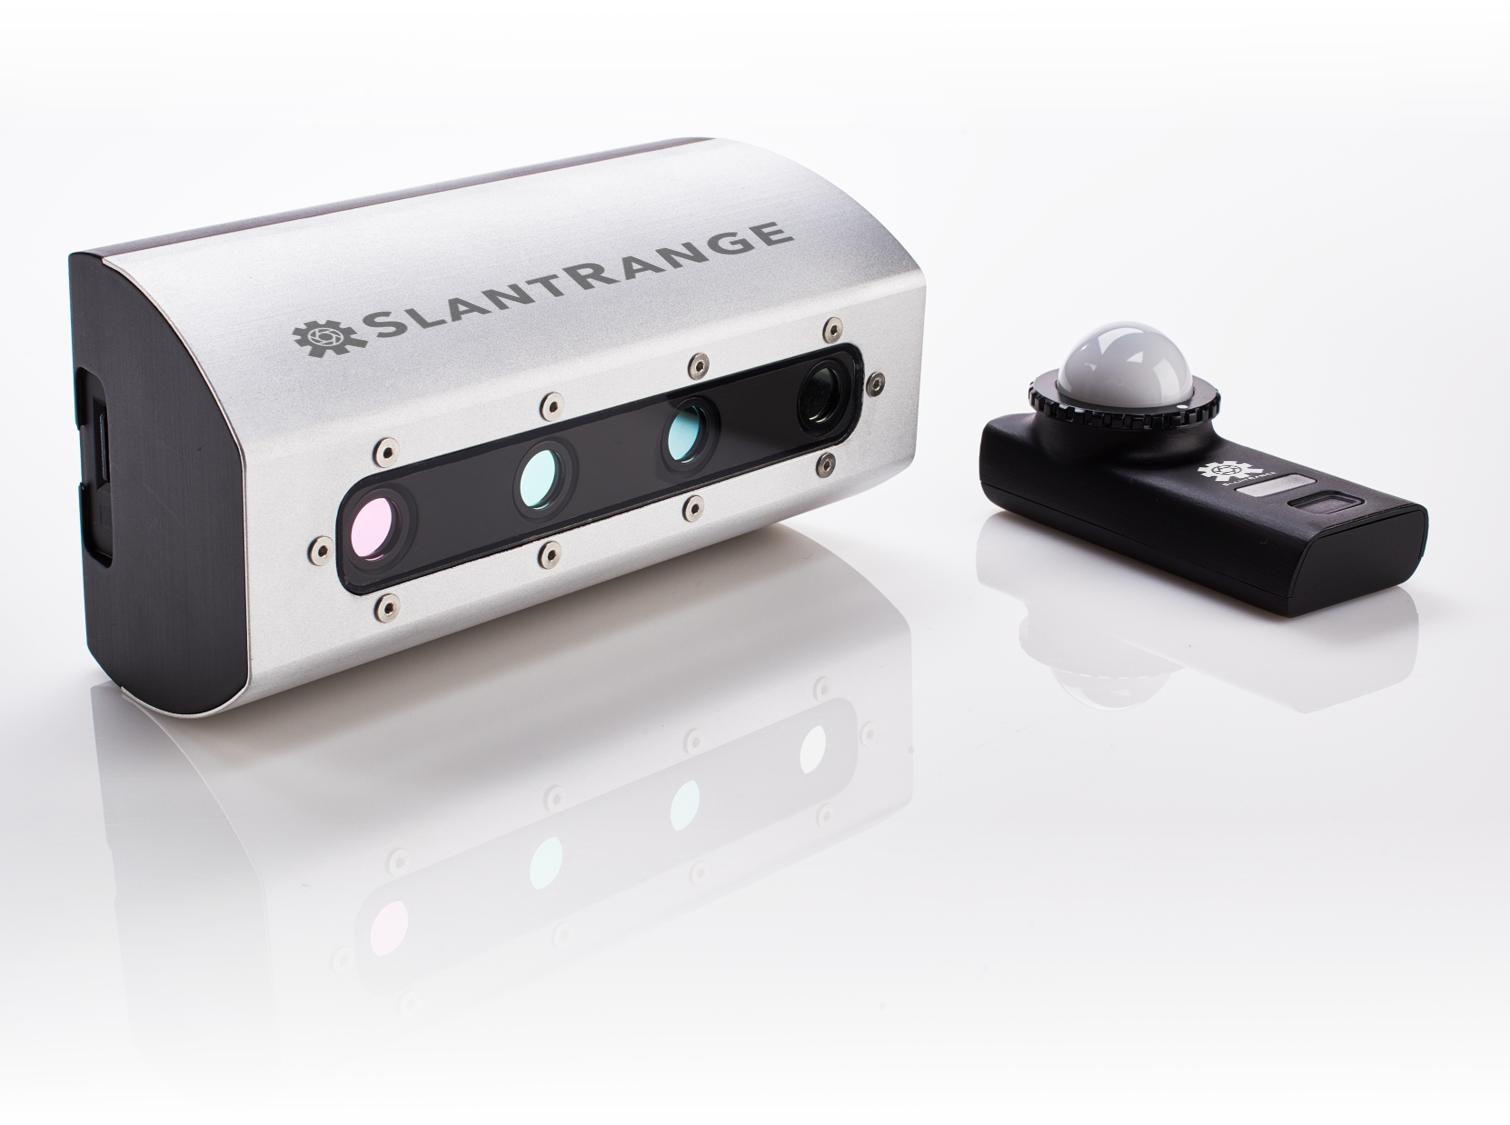 The Slantrange 3p